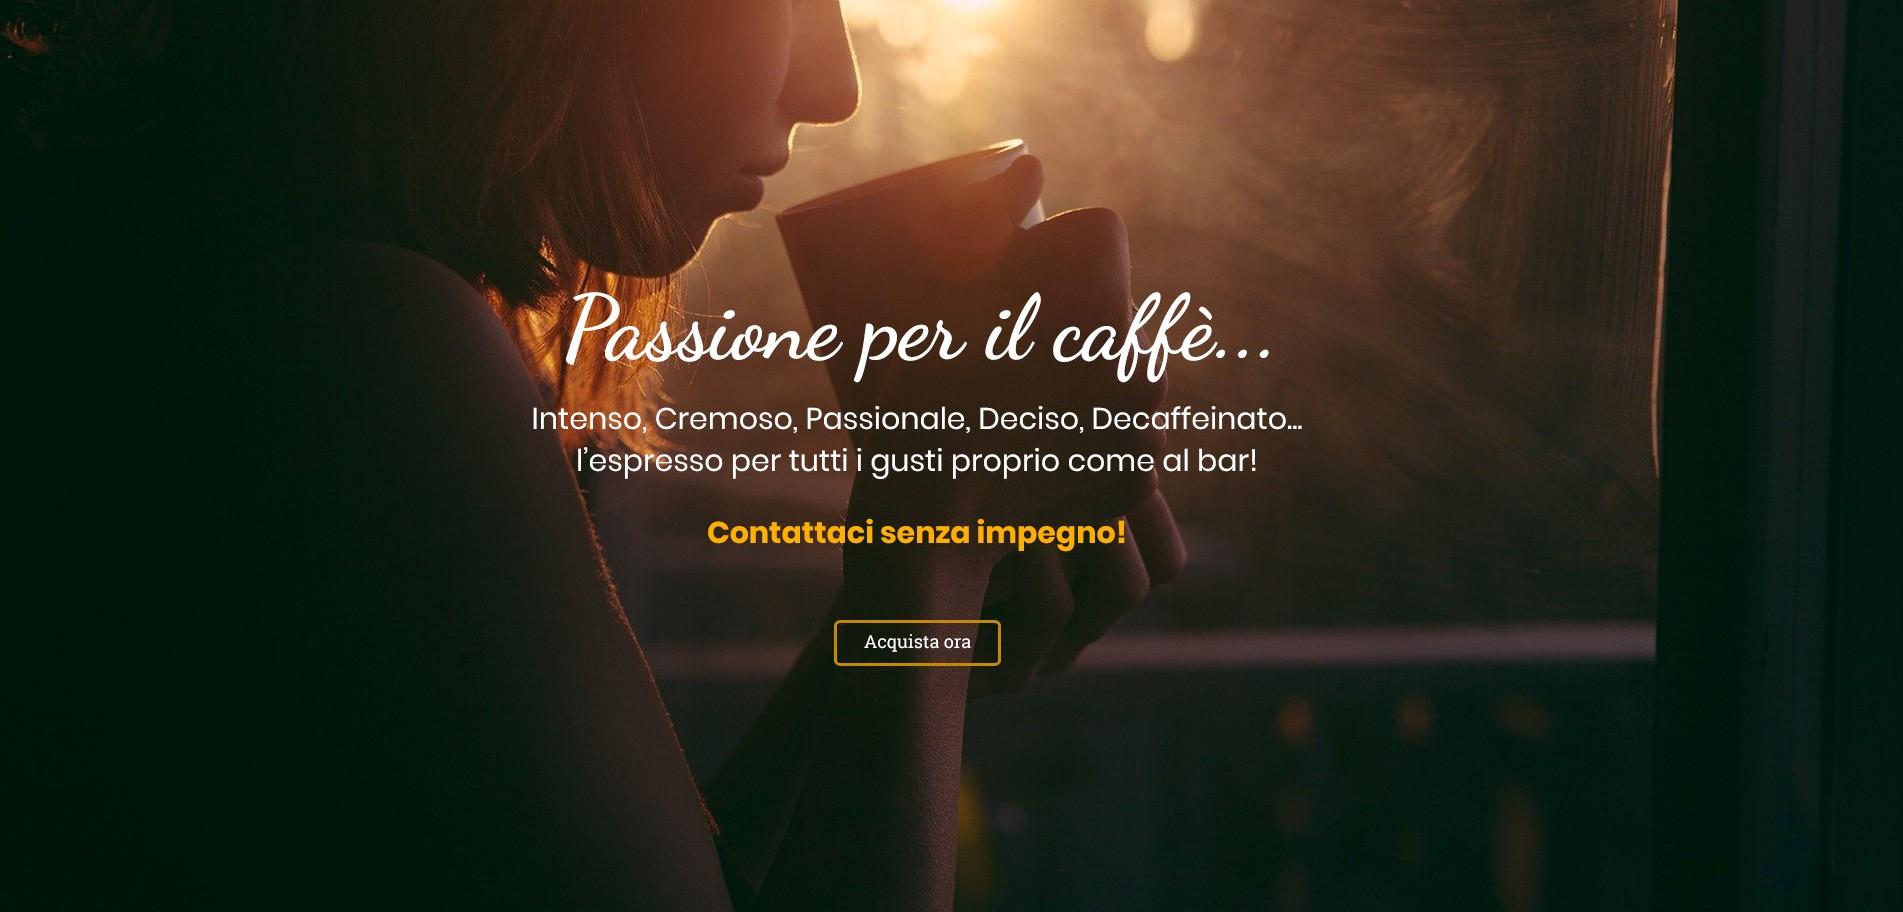 Capsule - Sprint Caffè